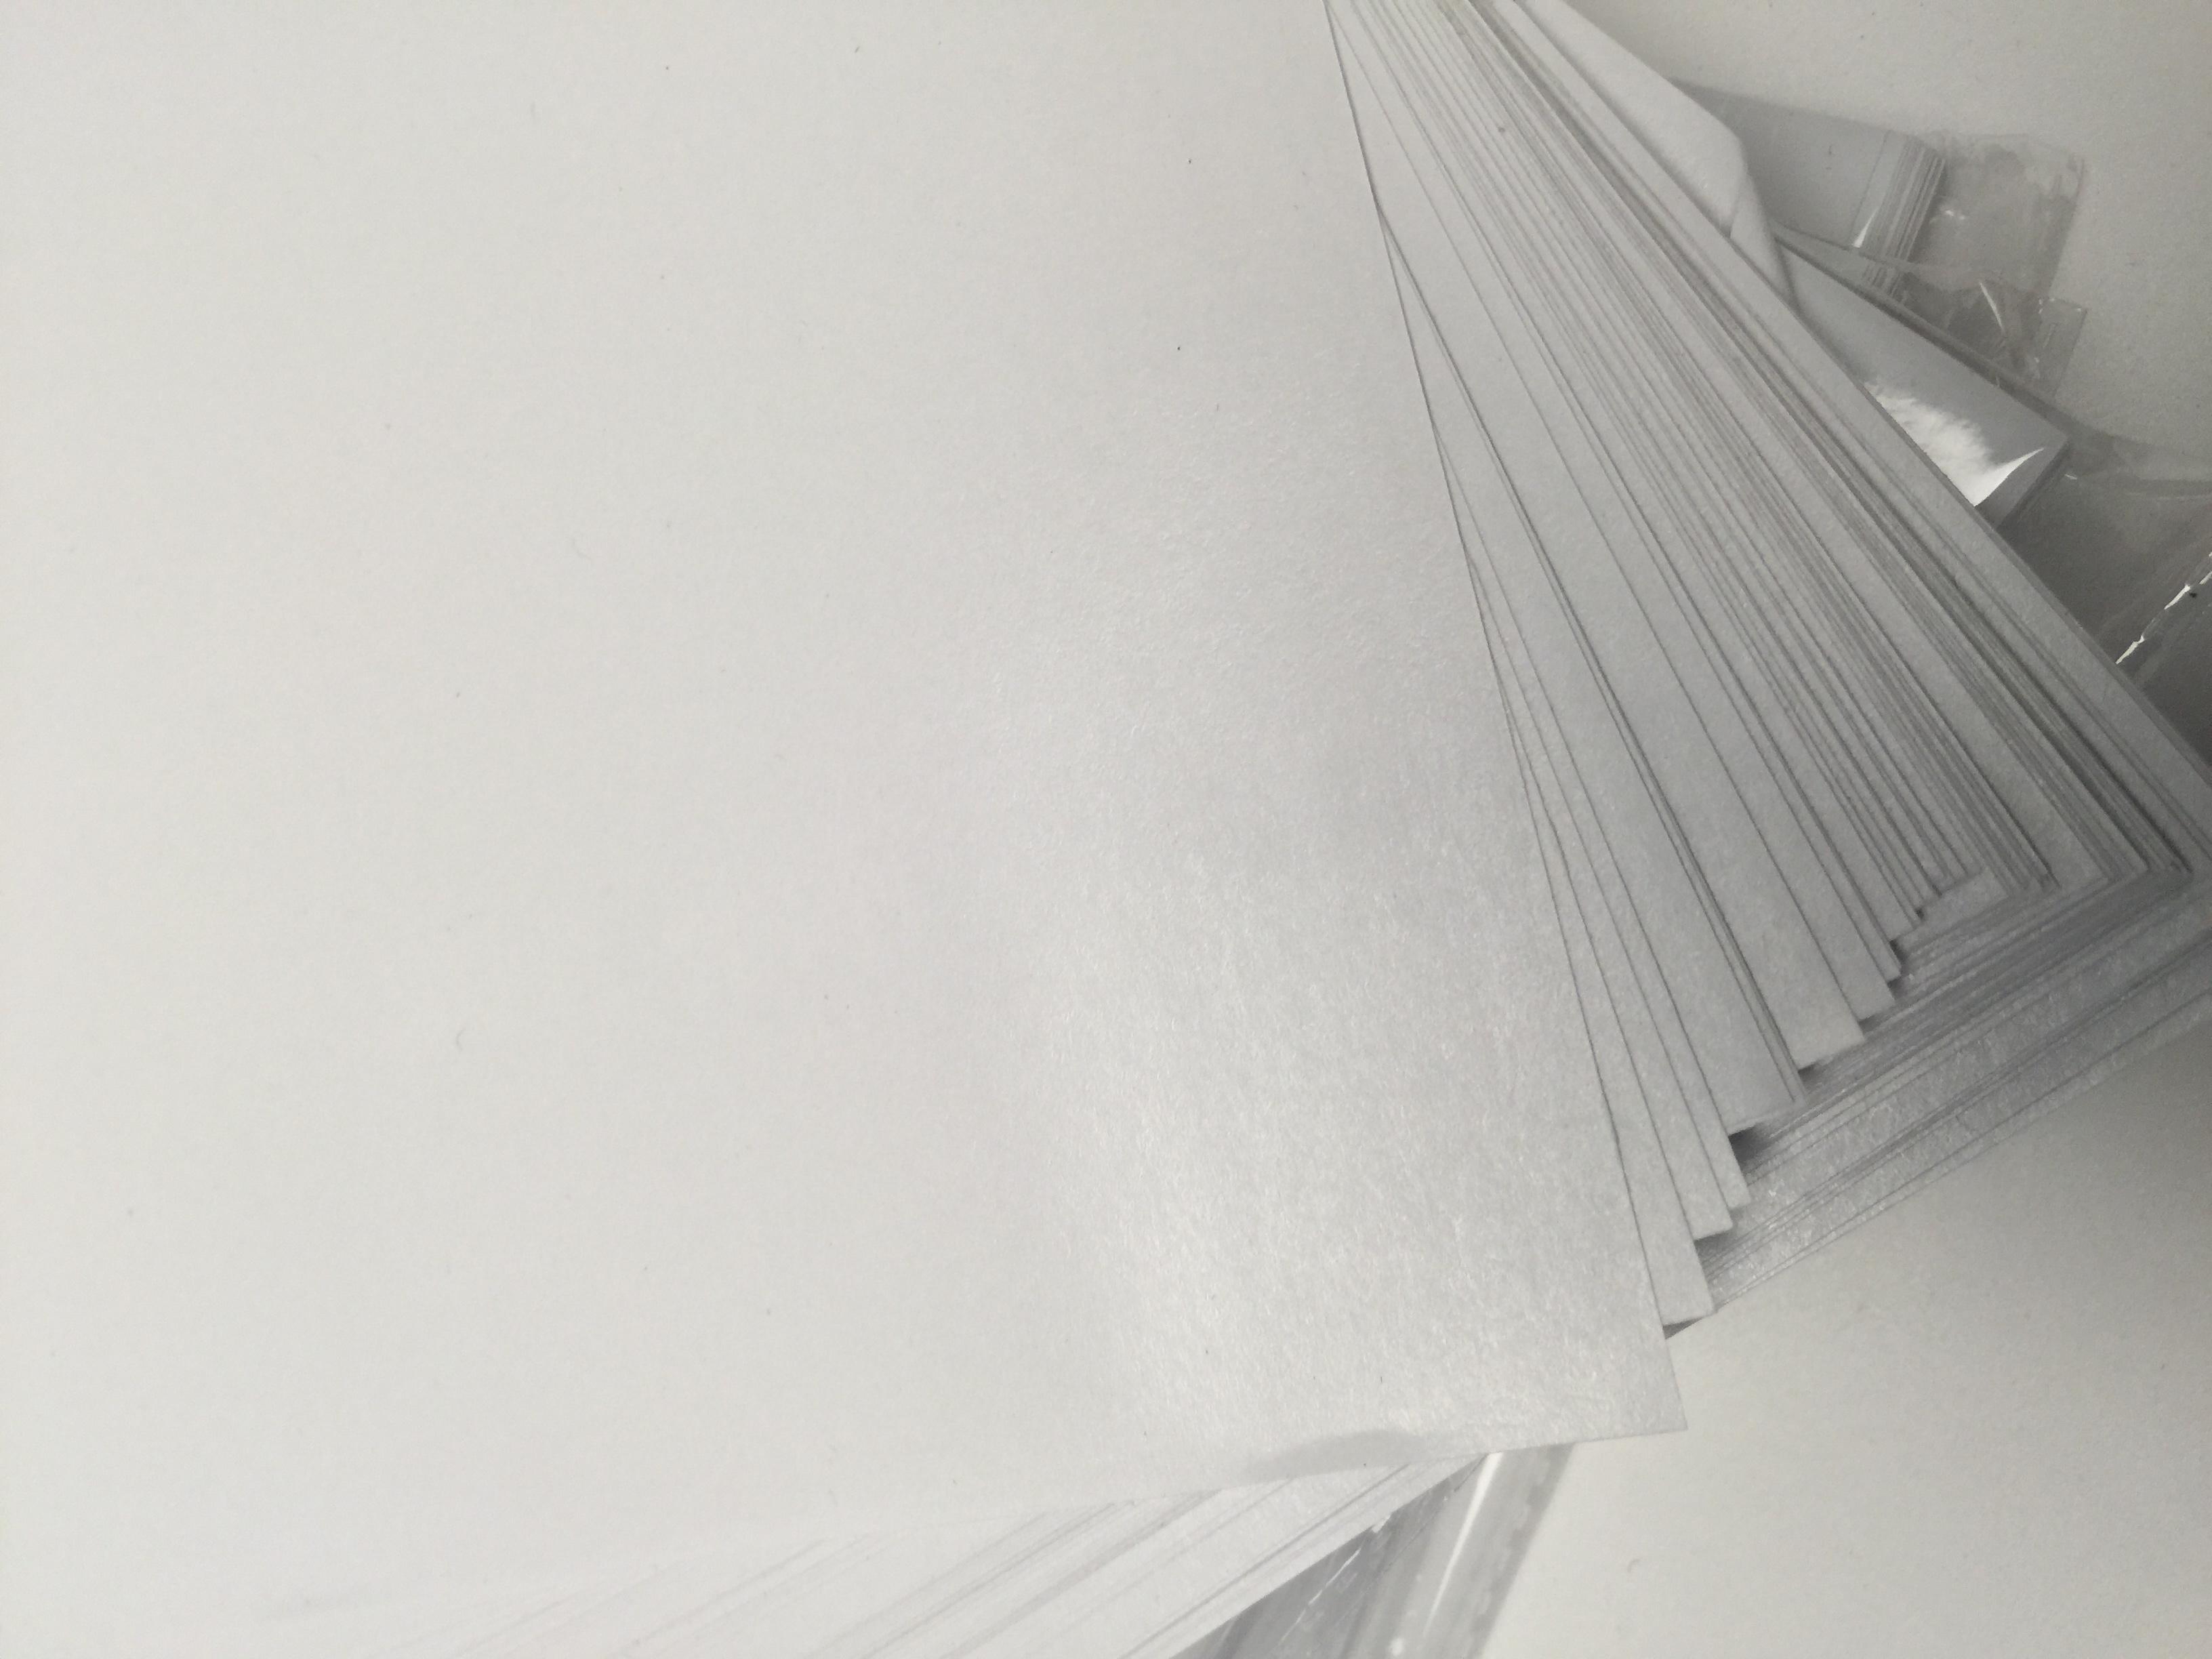 a4A4防粘纸离型纸隔离纸不干胶硅油纸剪纸贴手粘胶带diy手帐100张